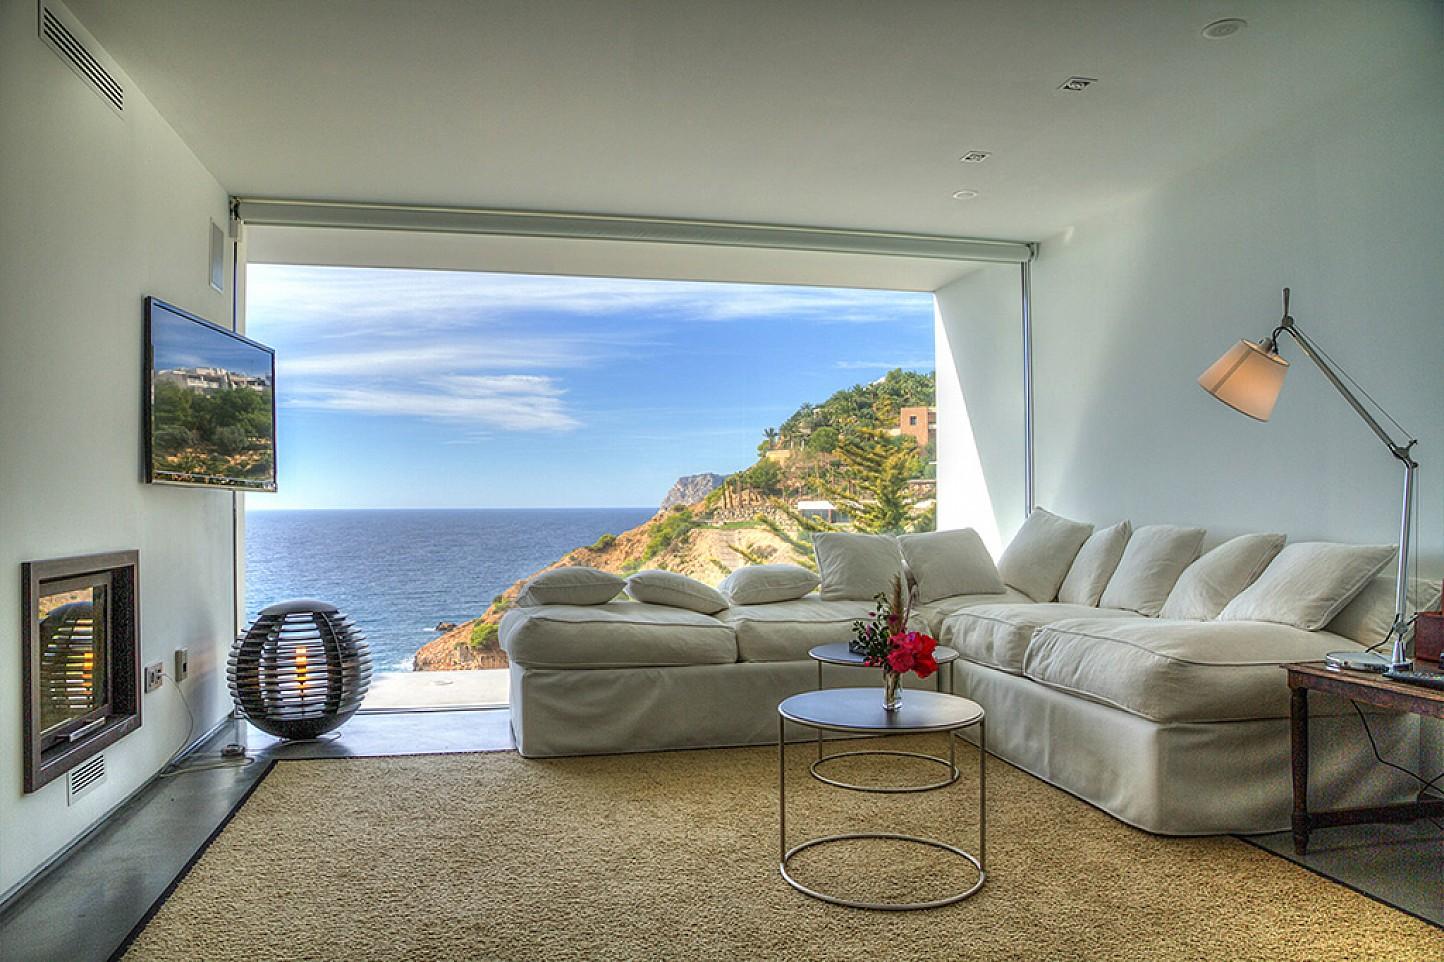 Sala de estar con estupendas vistas al mar